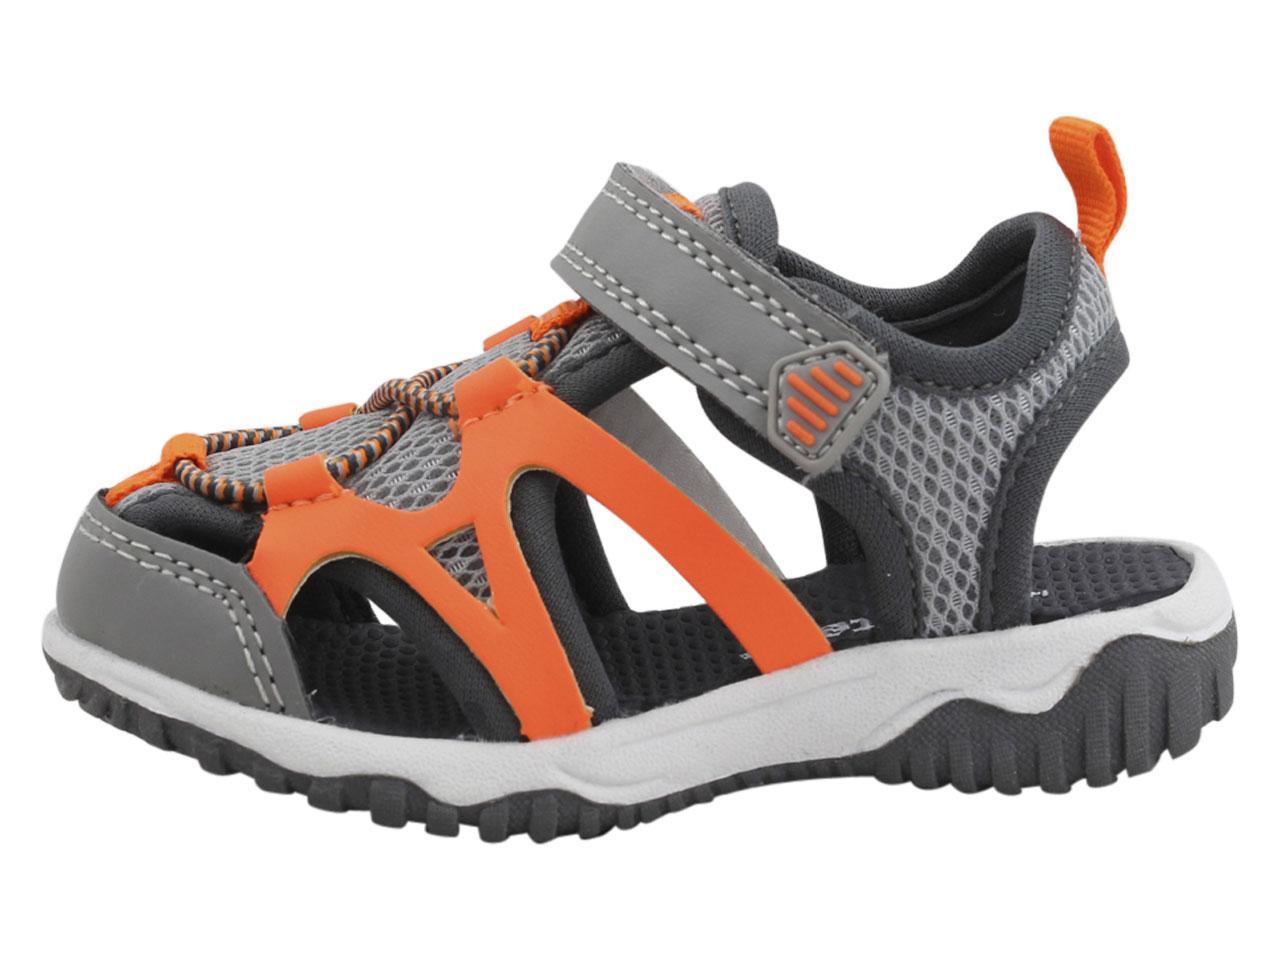 Carter-039-s-Toddler-Boy-039-s-Zyntec-B-Sandals-Shoes thumbnail 15